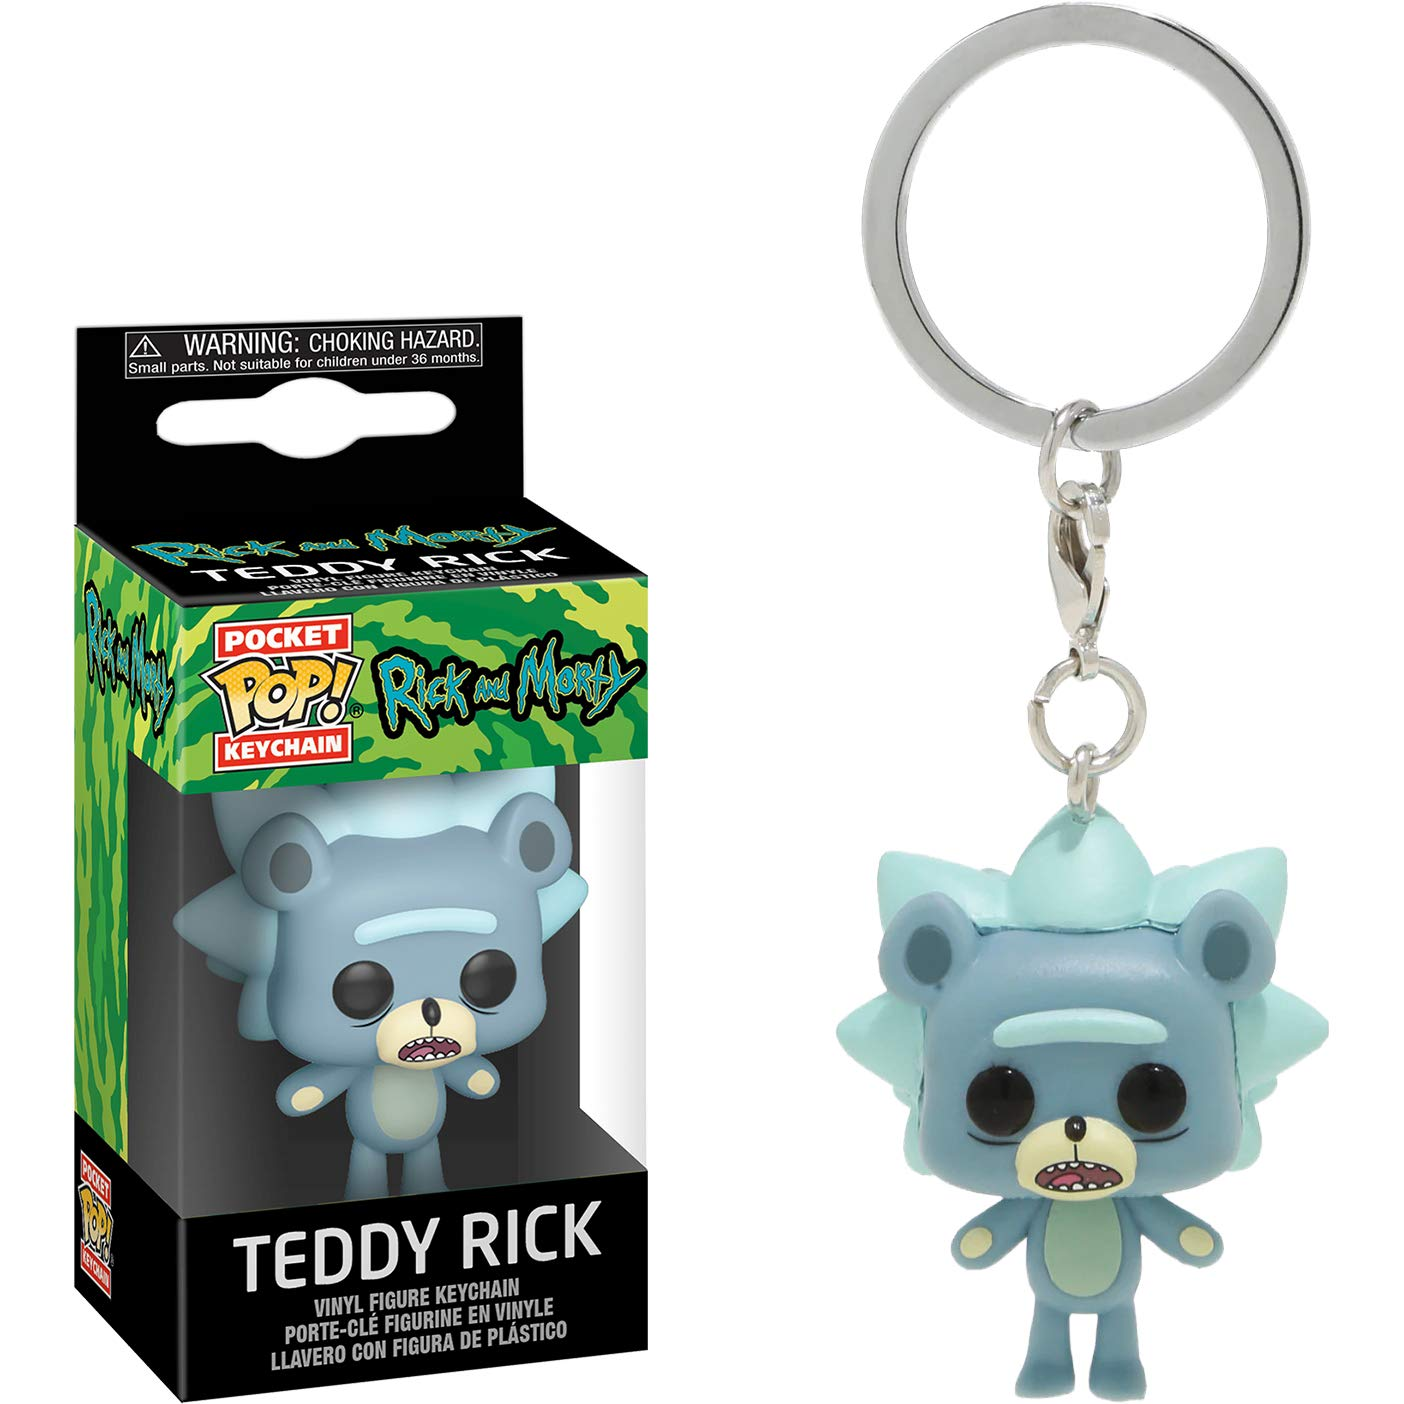 Rick & Morty Pocket POP! Vinyl Keychain Teddy Rick 4 cm